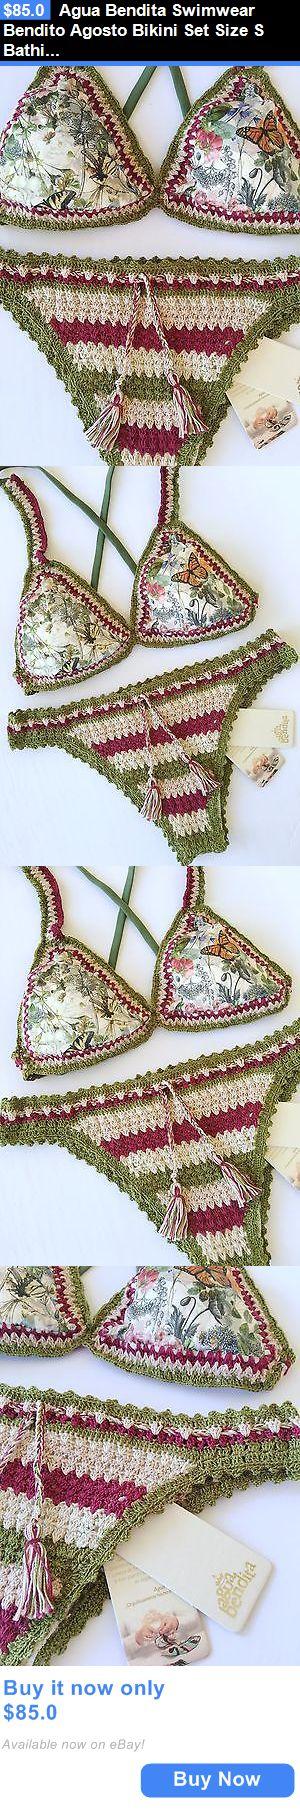 Women Swimwear: Agua Bendita Swimwear Bendito Agosto Bikini Set Size S Bathing Suit Colombia BUY IT NOW ONLY: $85.0